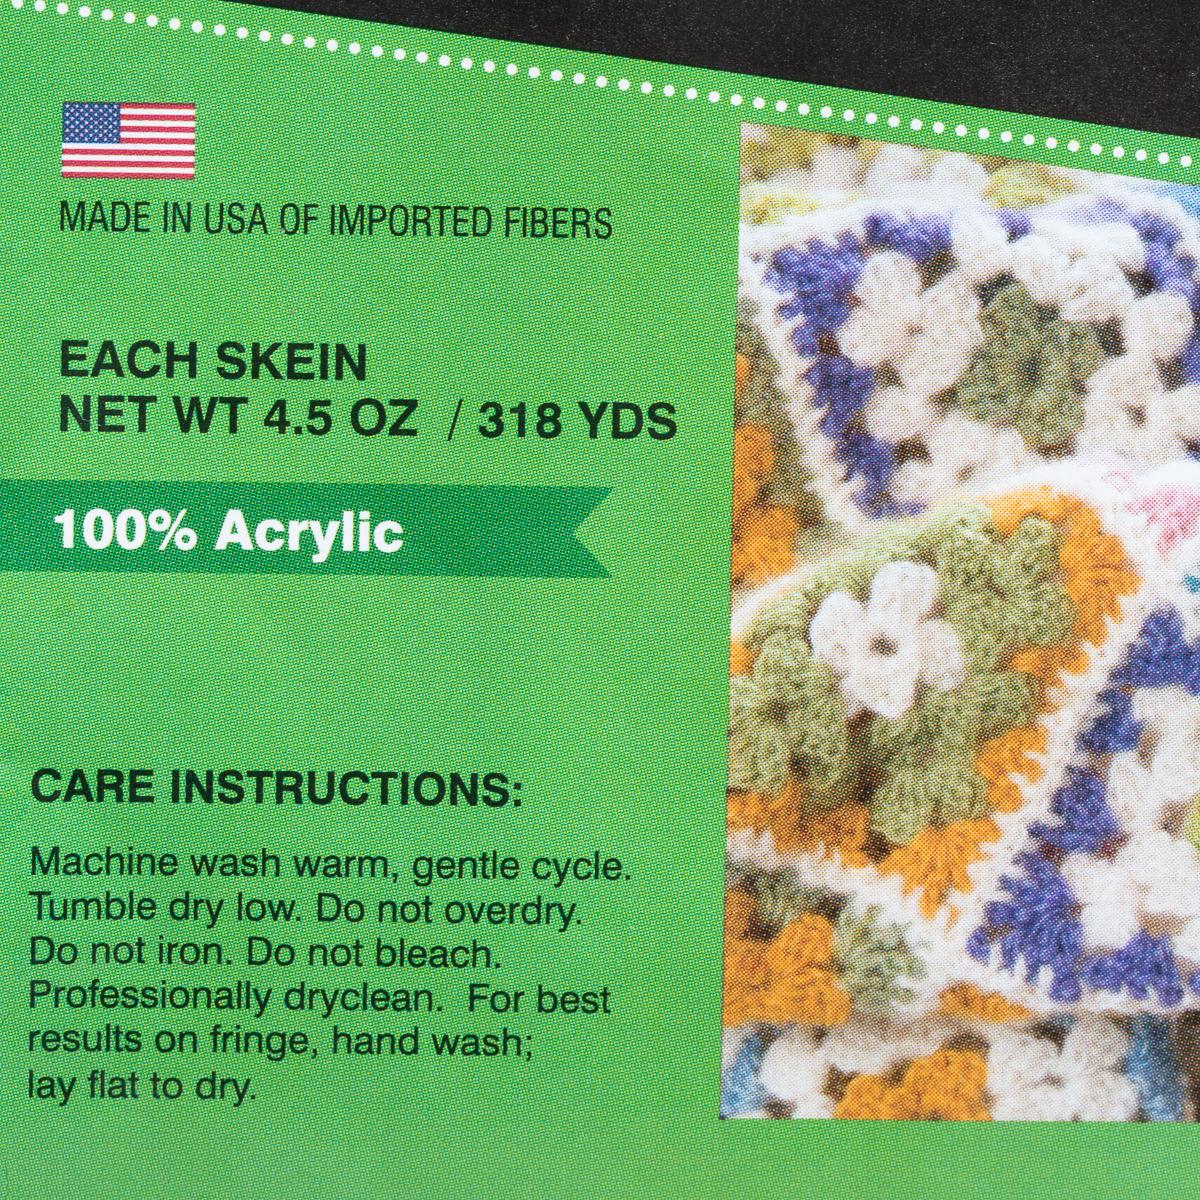 4-Dream-Weaver-Solid-S-Twist-100-Acrylic-Yarn-Skeins-Light-3-Knit-Crochet-Soft thumbnail 19